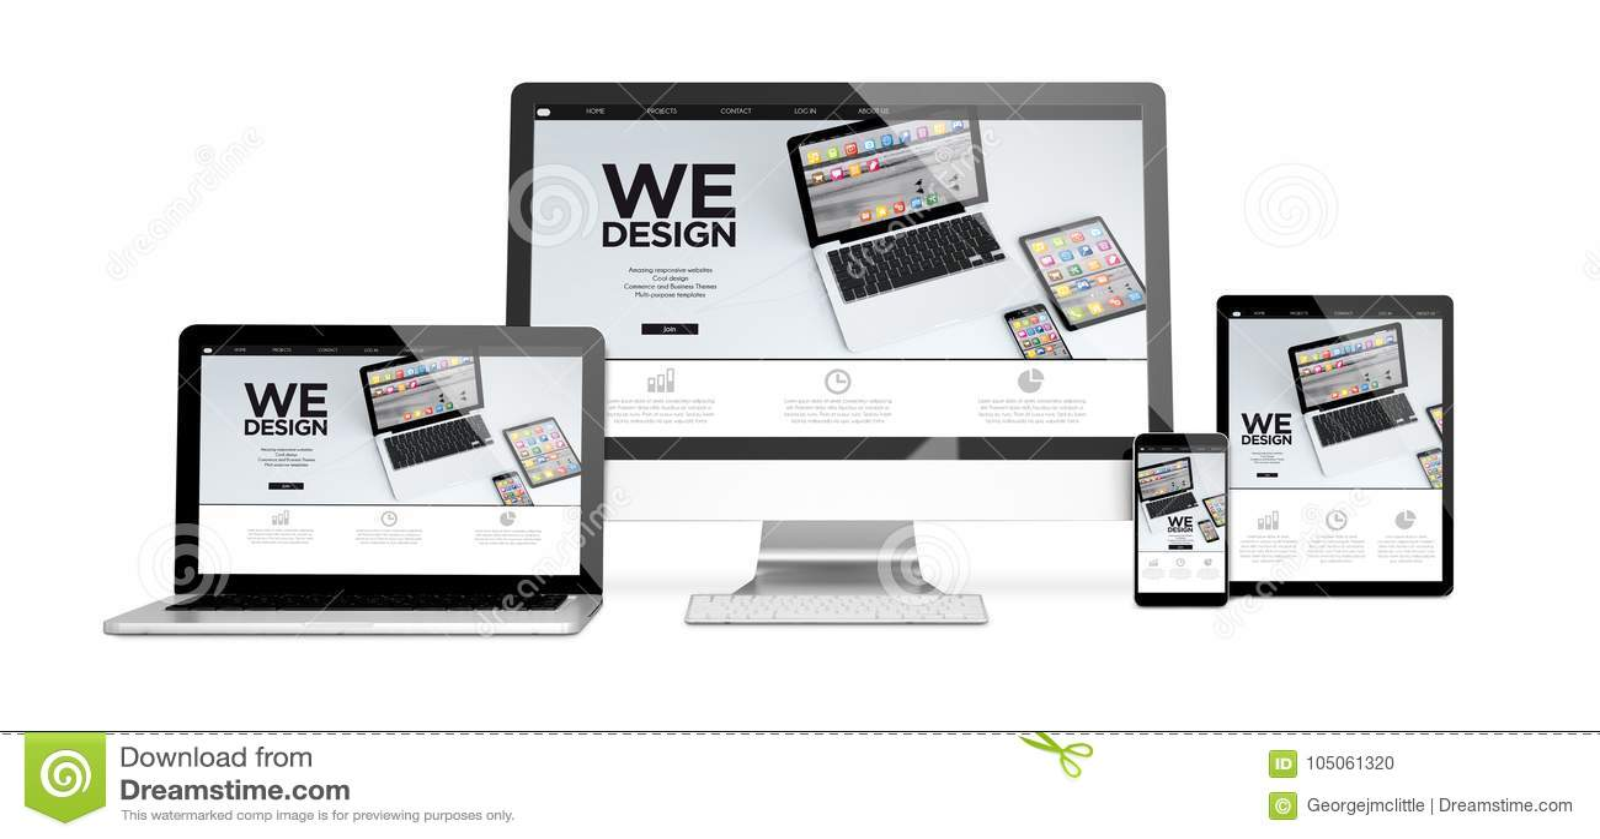 Geräte lokalisierten wedesign